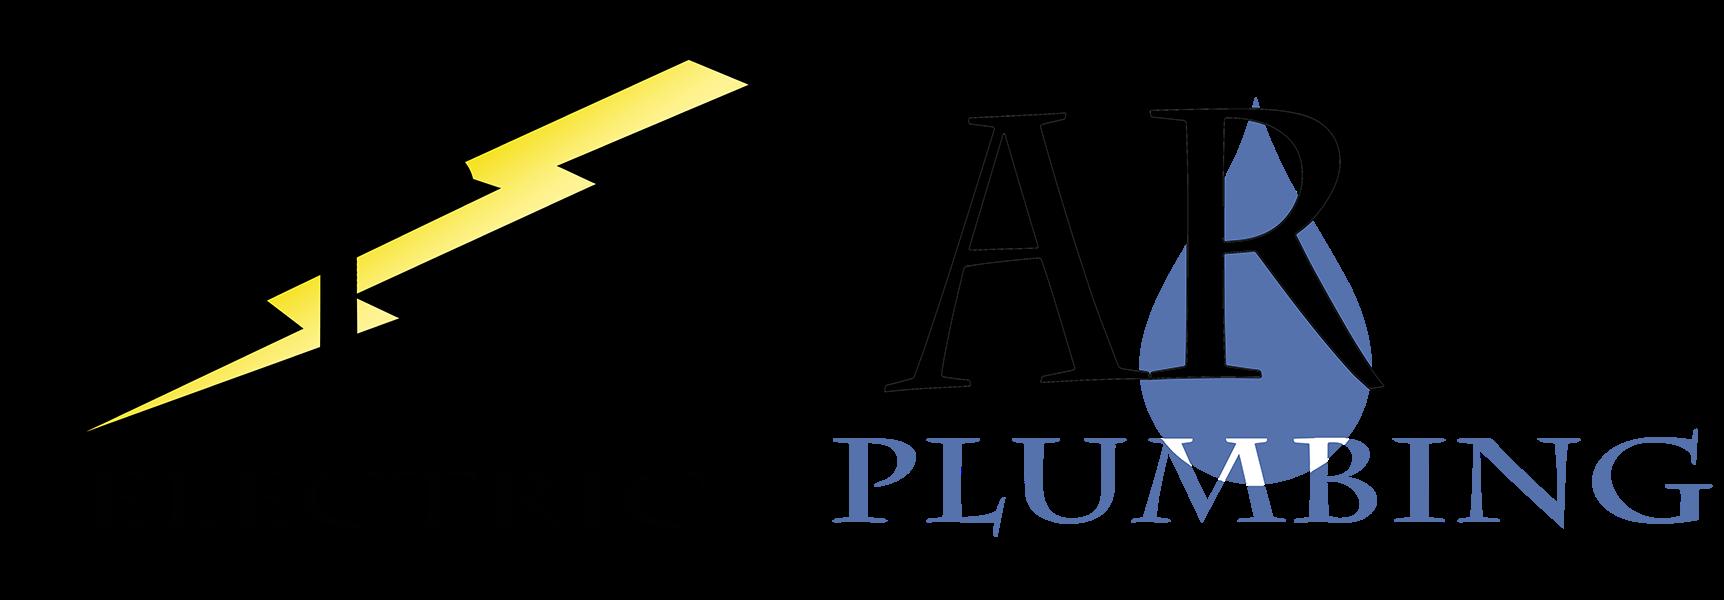 ARC Electric / ARC Plumbing